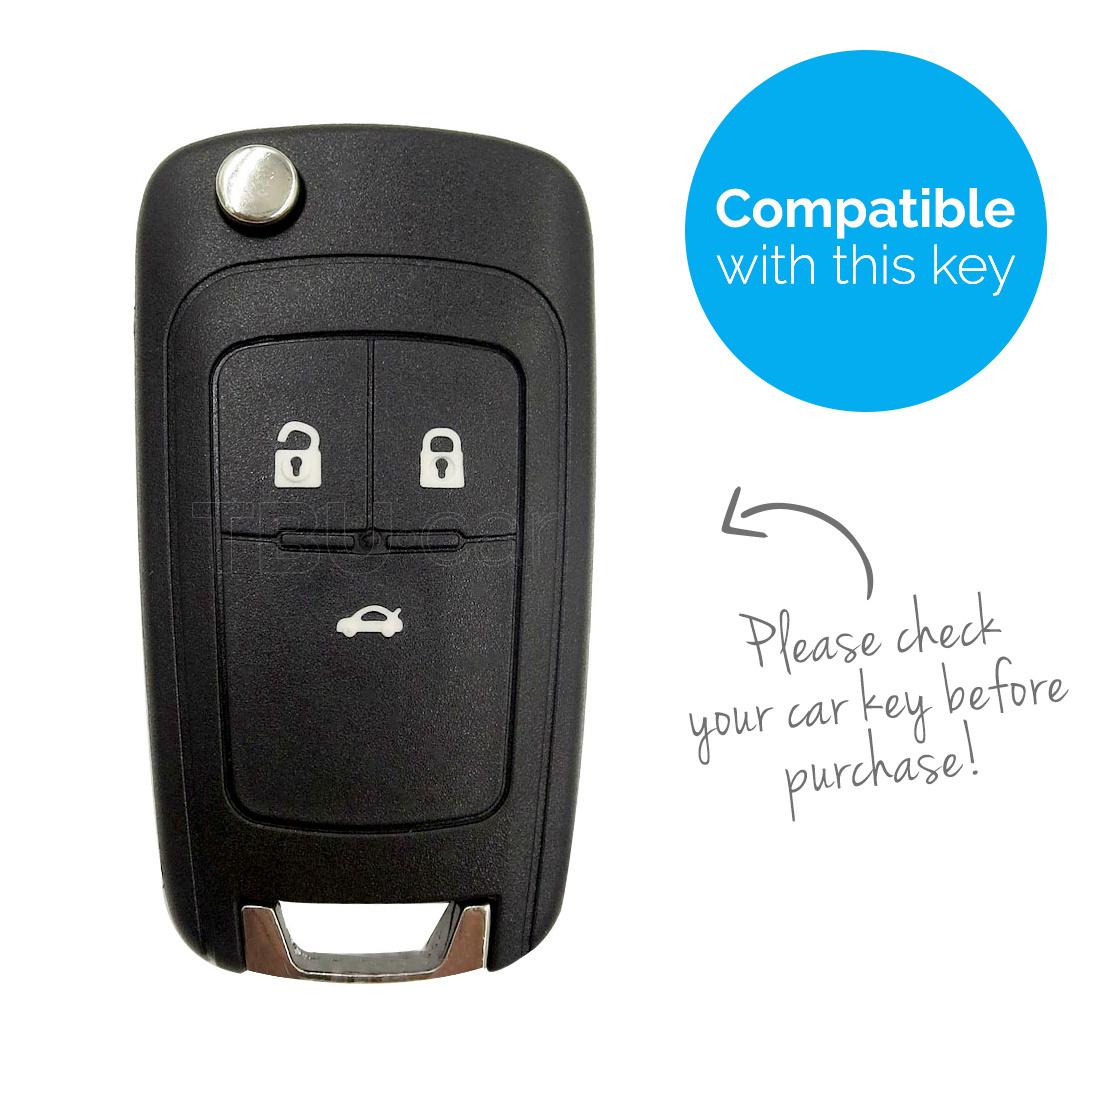 TBU car TBU car Sleutel cover compatibel met Chevrolet - Silicone sleutelhoesje - beschermhoesje autosleutel - Blauw